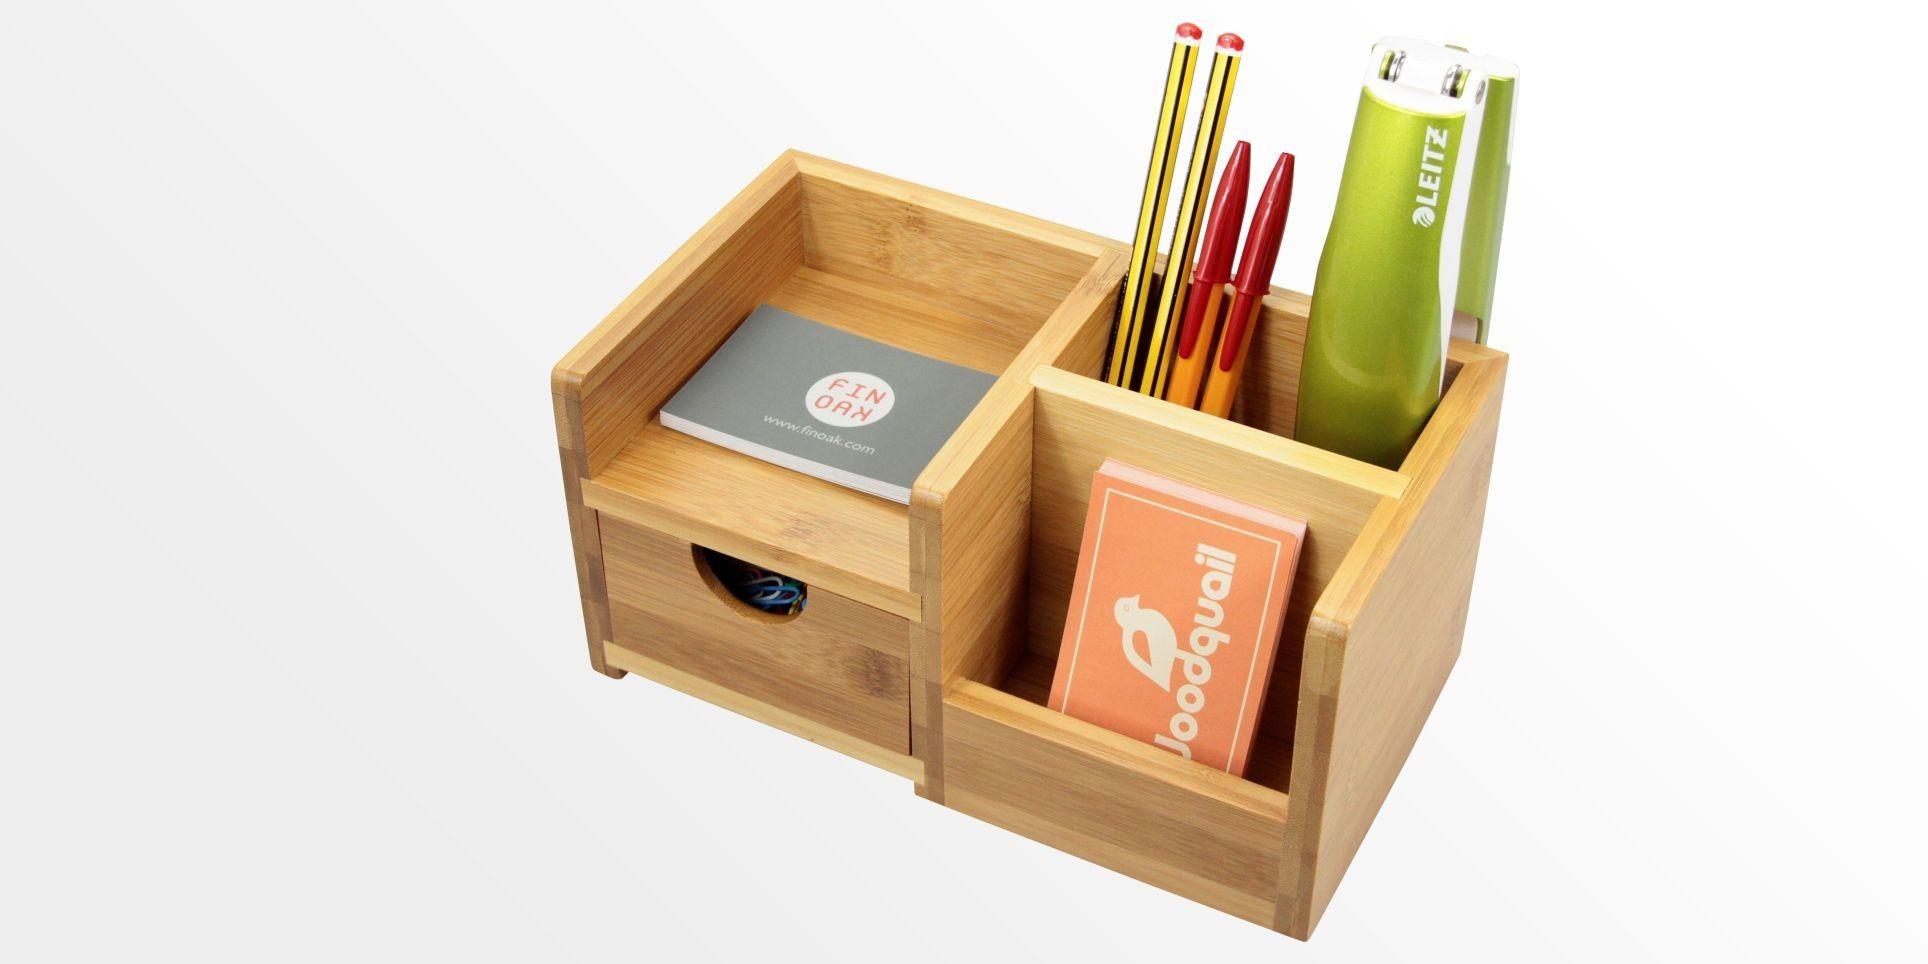 Desk Organiser Pen Holder And Drawer Bamboo Stationery Box Office Supplies Wooden Desk Organizer Desk Organization Desk Tidy